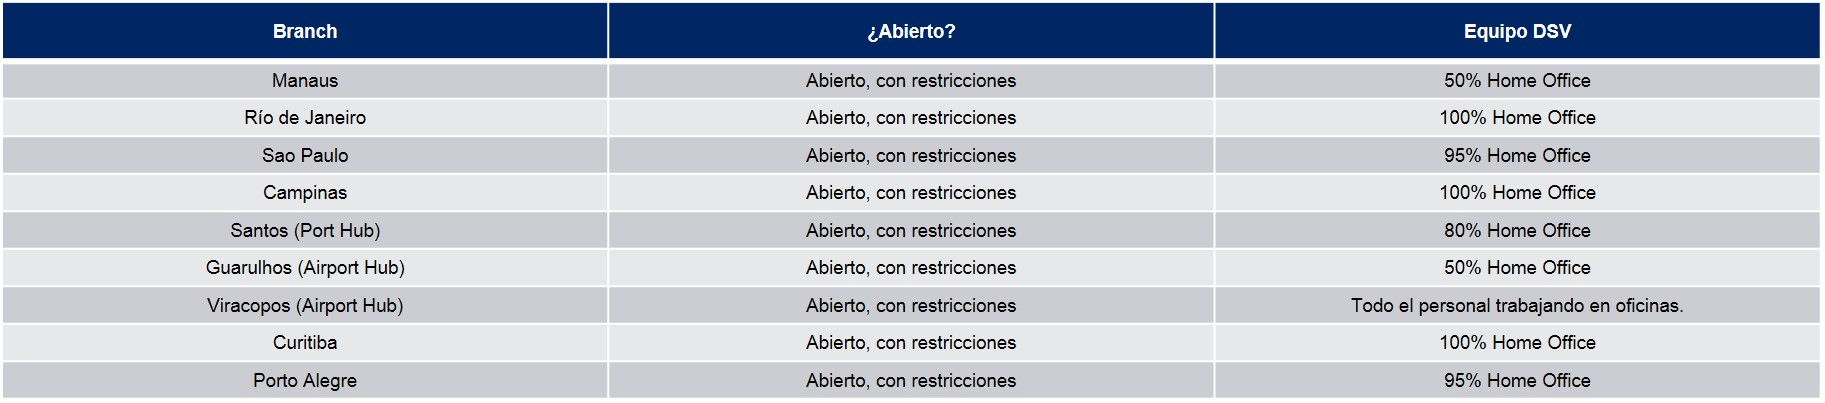 Tabla Operaciones DSV Brasil COVID19 13/04/20